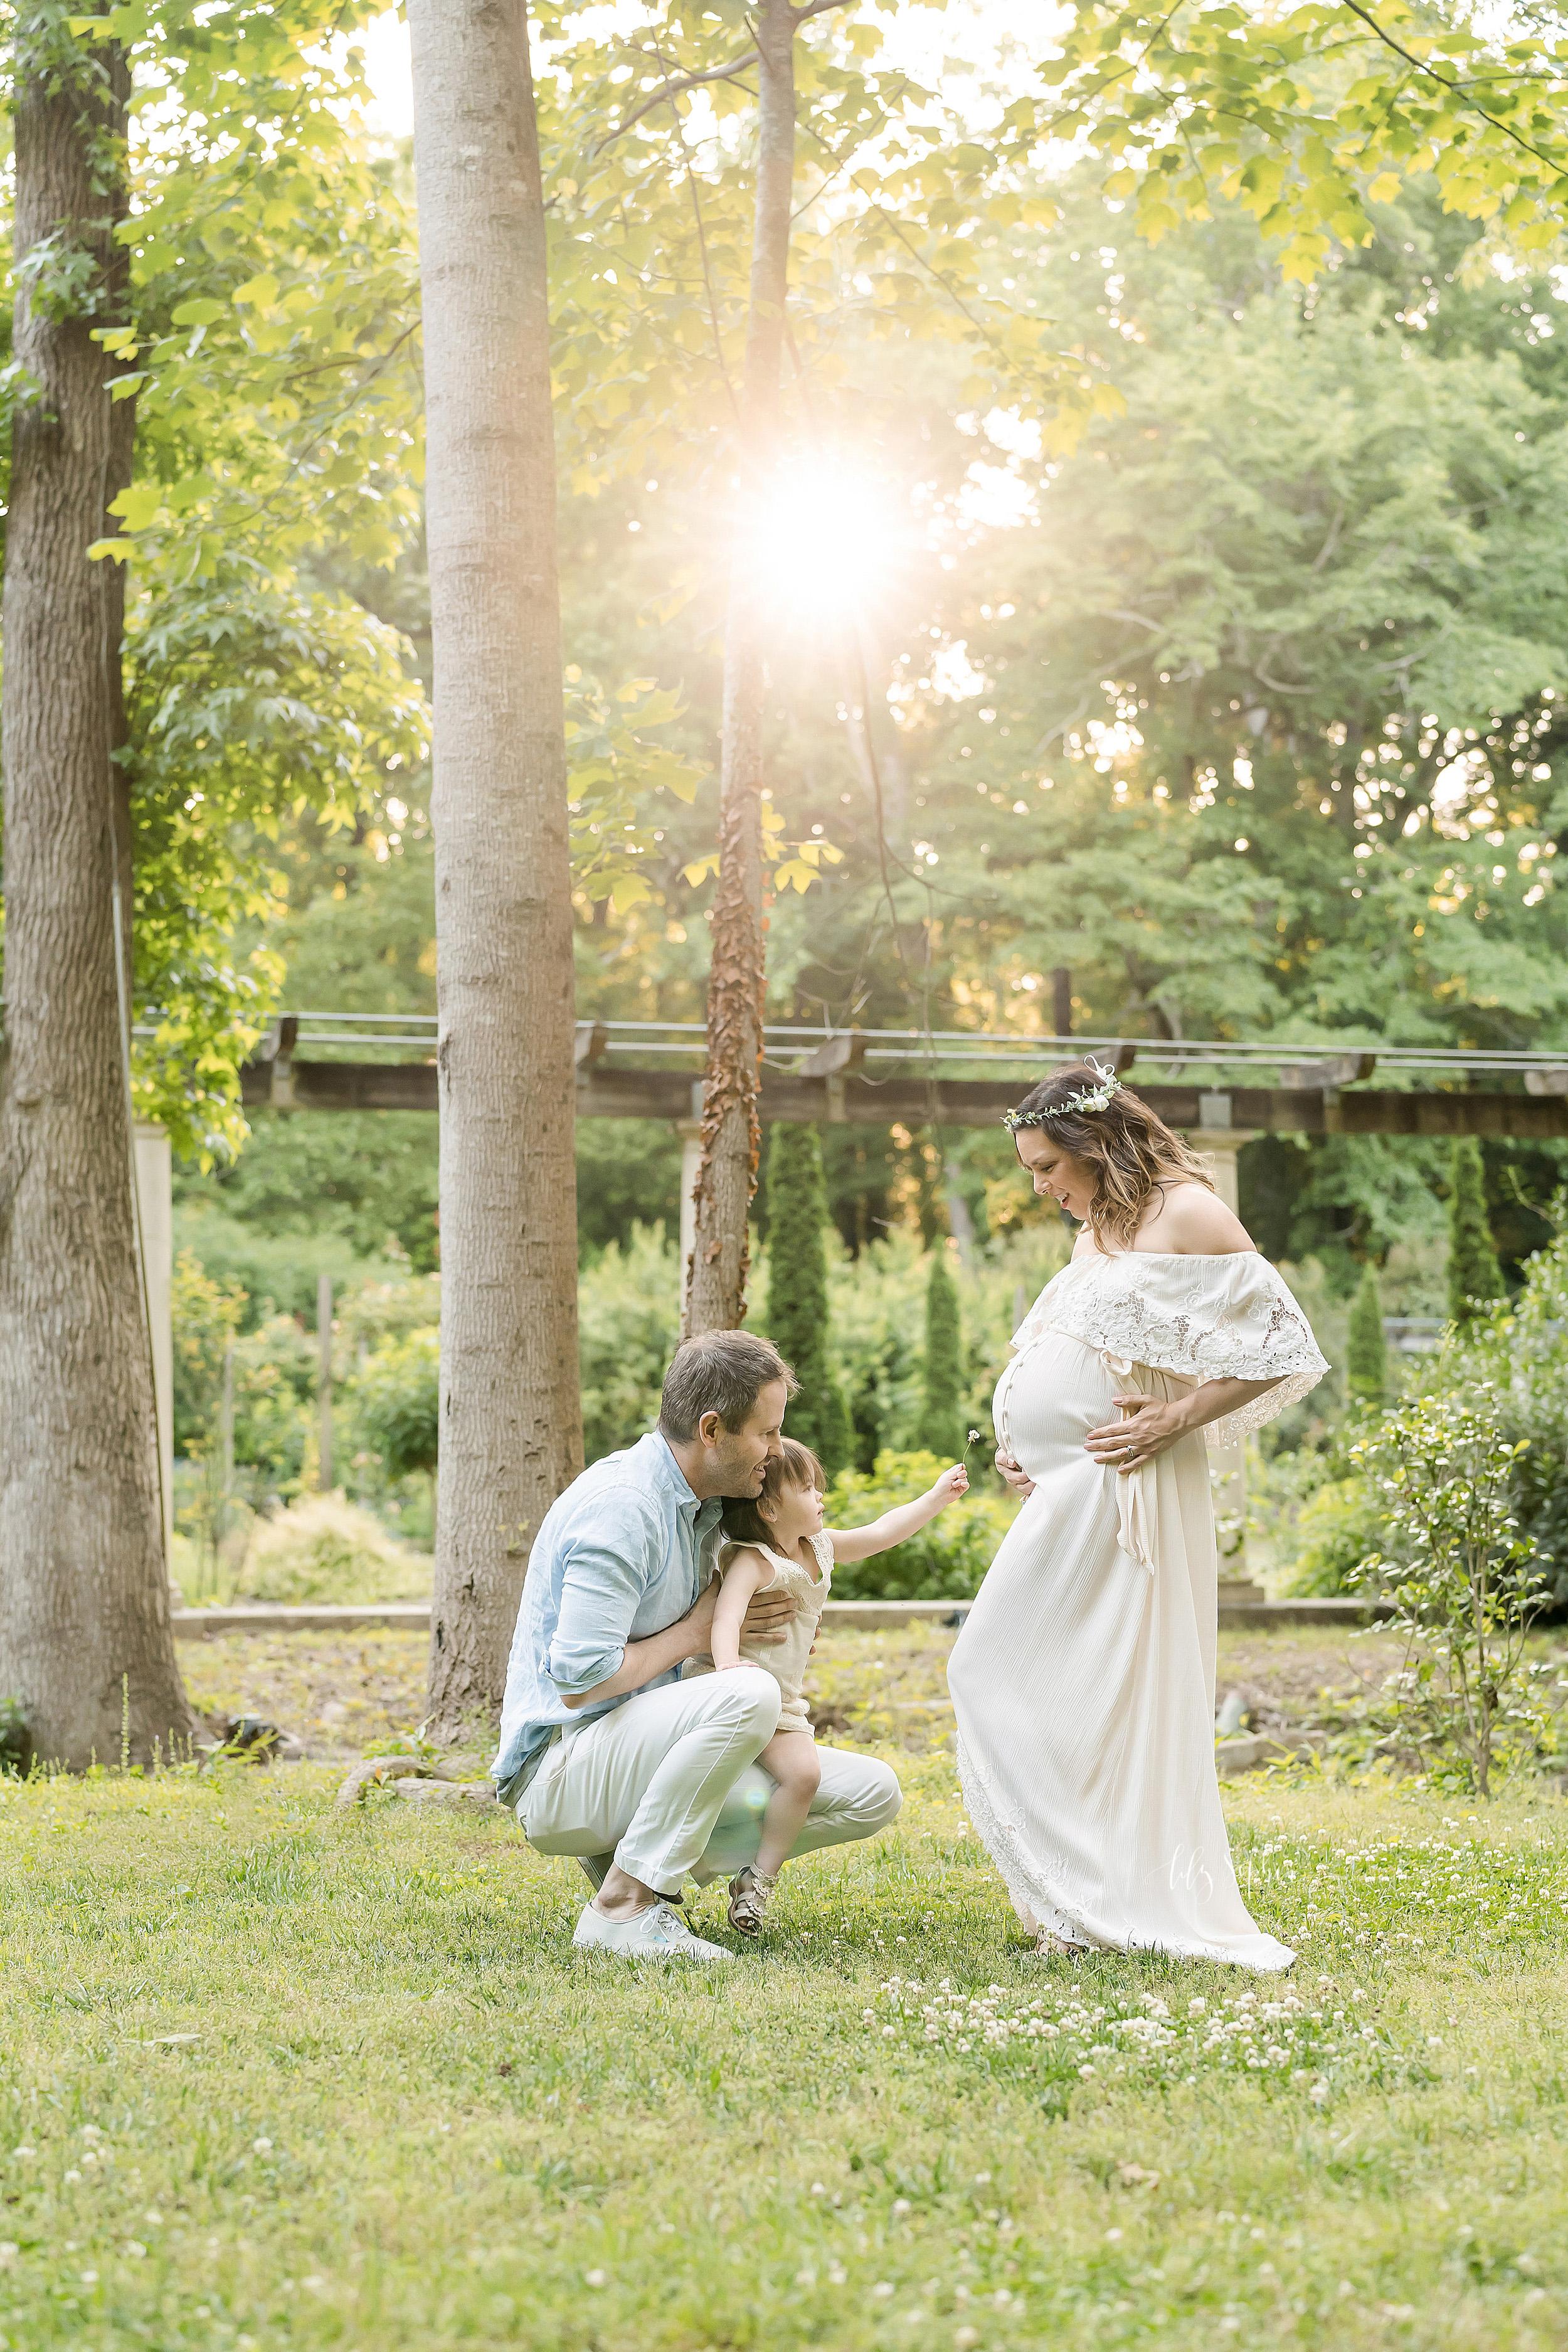 Family photo of three interacting at sunset in an Atlanta garden.